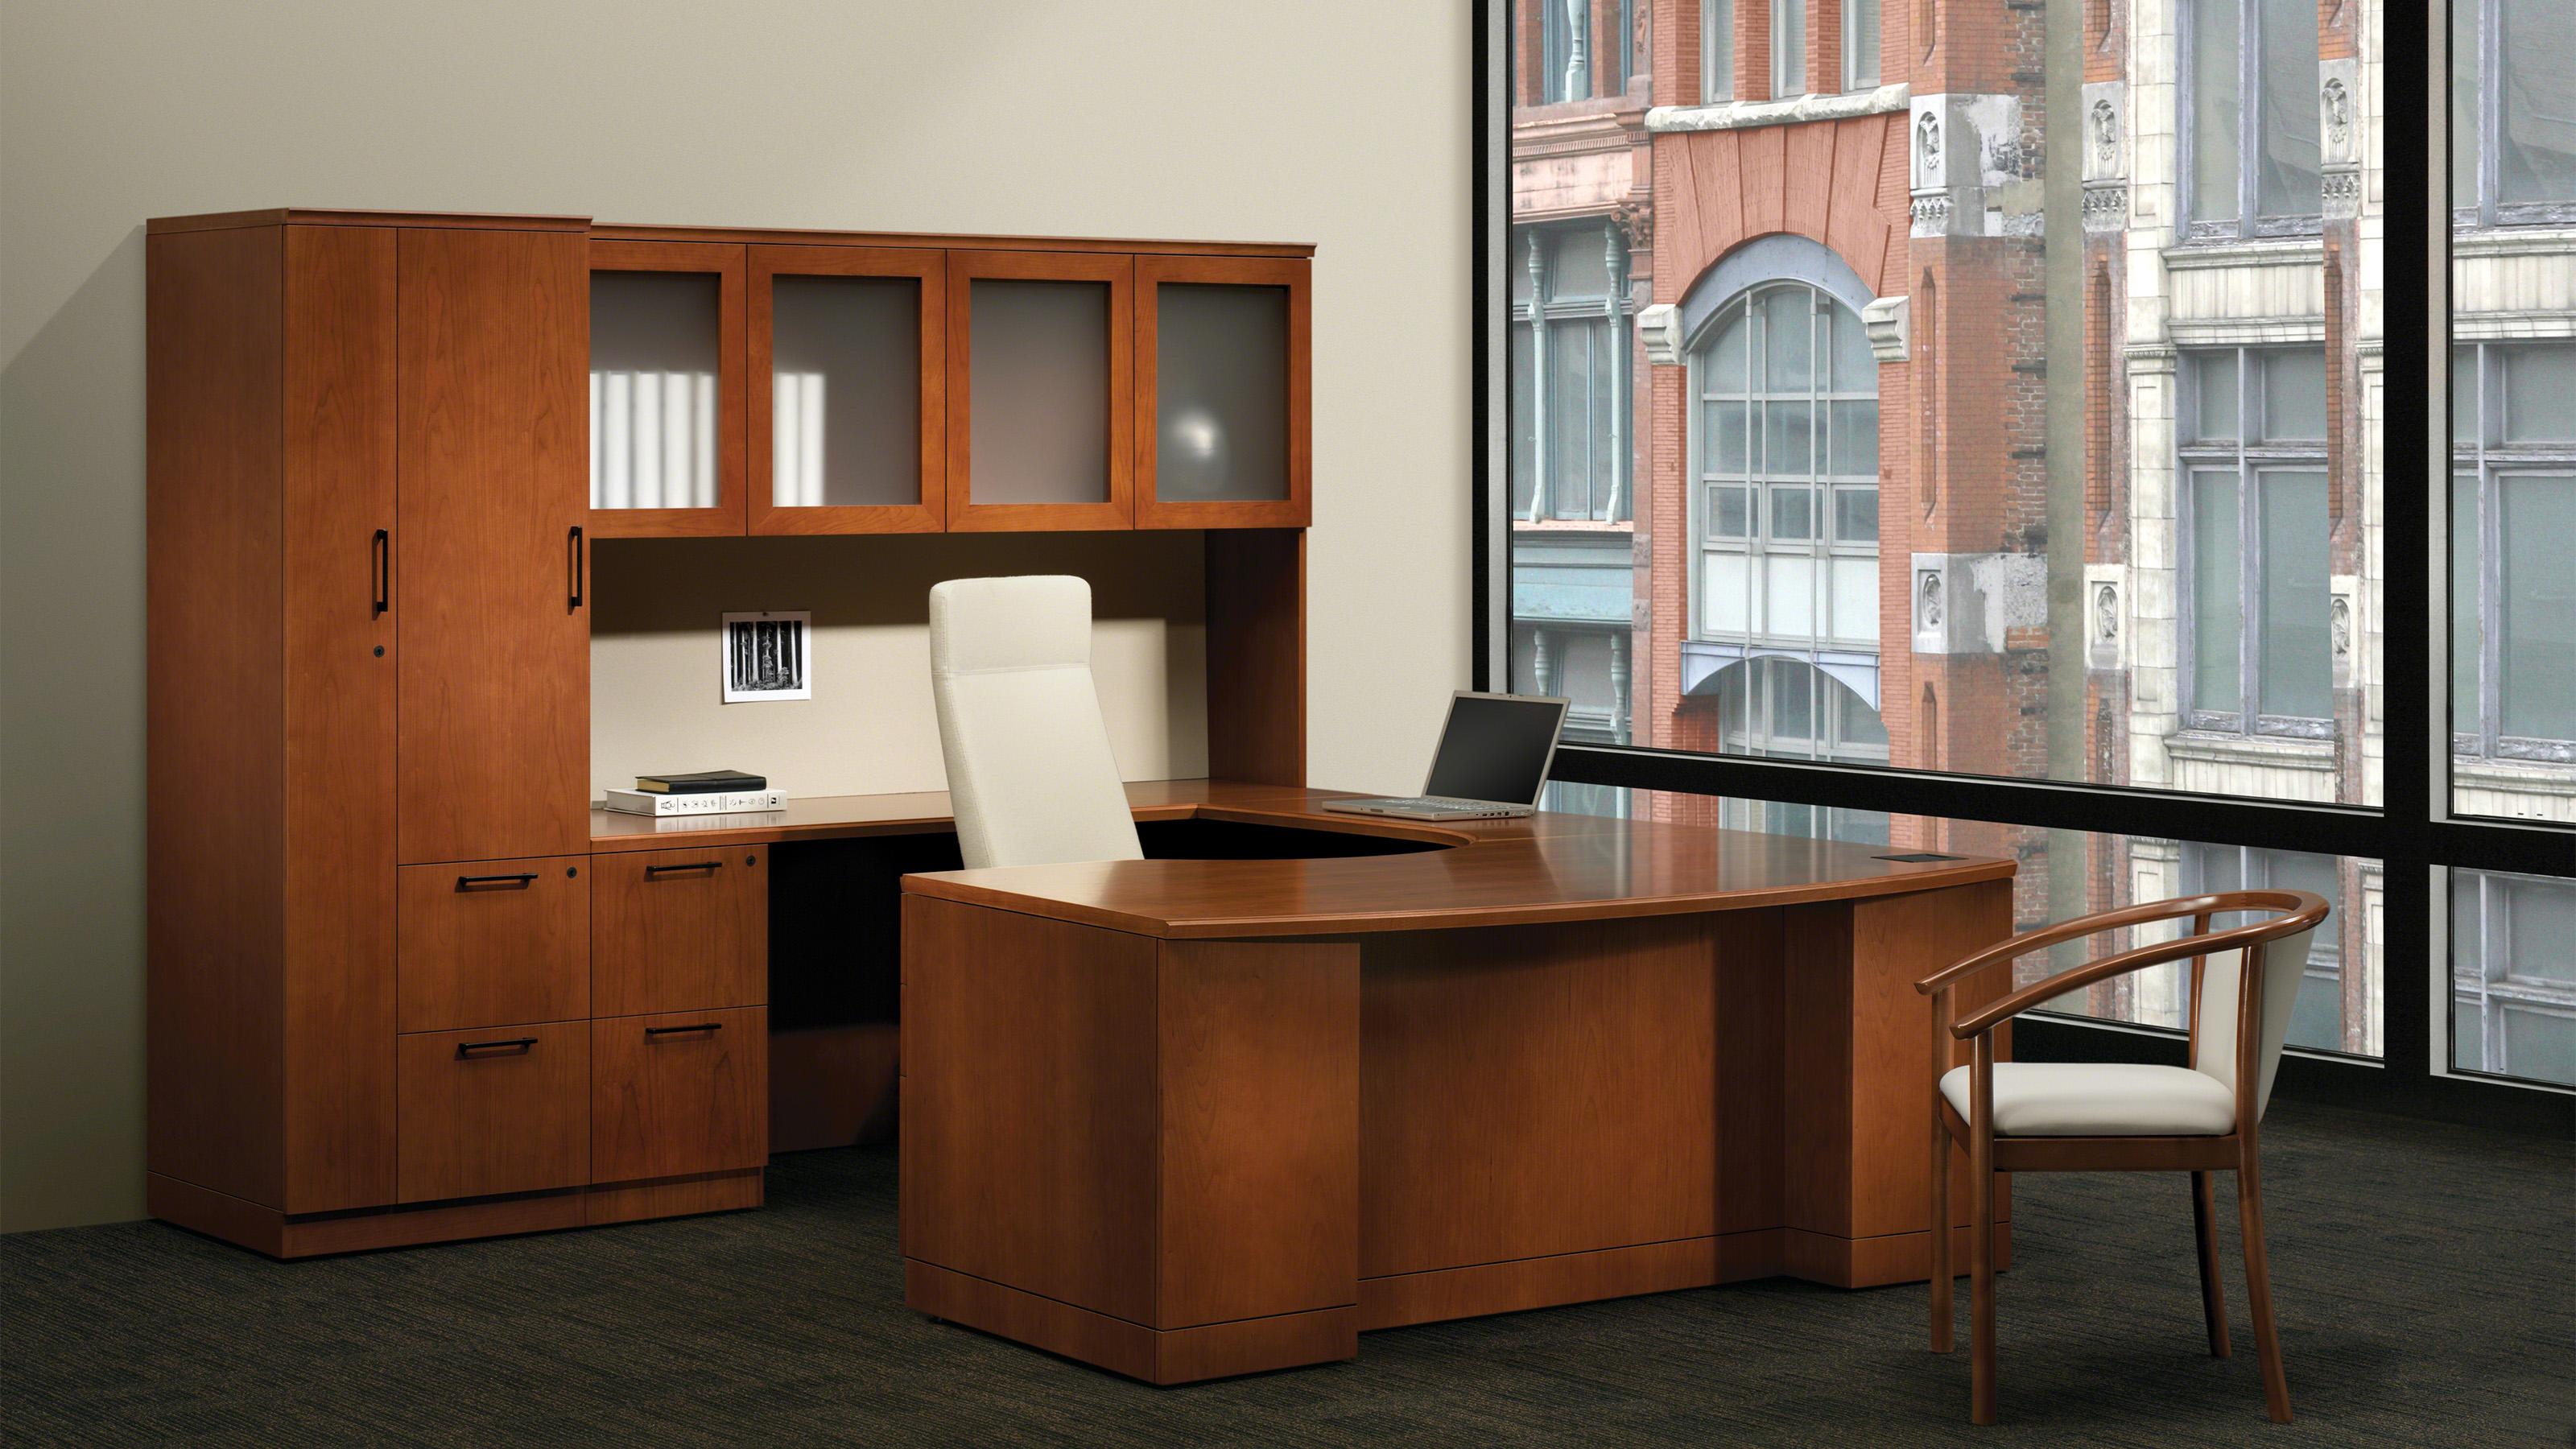 Solid Wood Furniture Oak